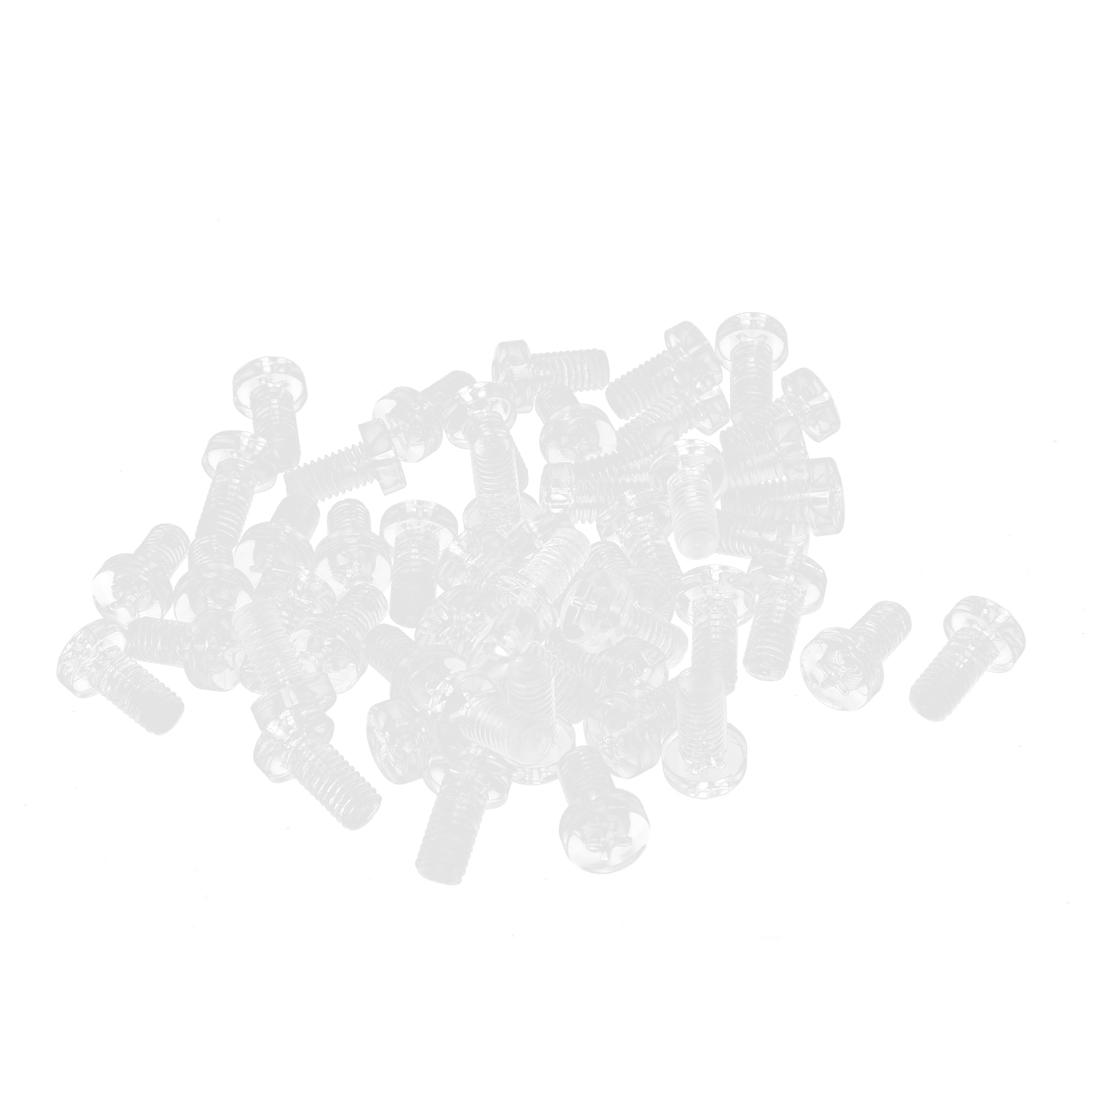 M6 x 12mm 1mm Pitch Phillips Pan Head Machine Screw Bolt Clear 50 Pcs - image 2 of 2